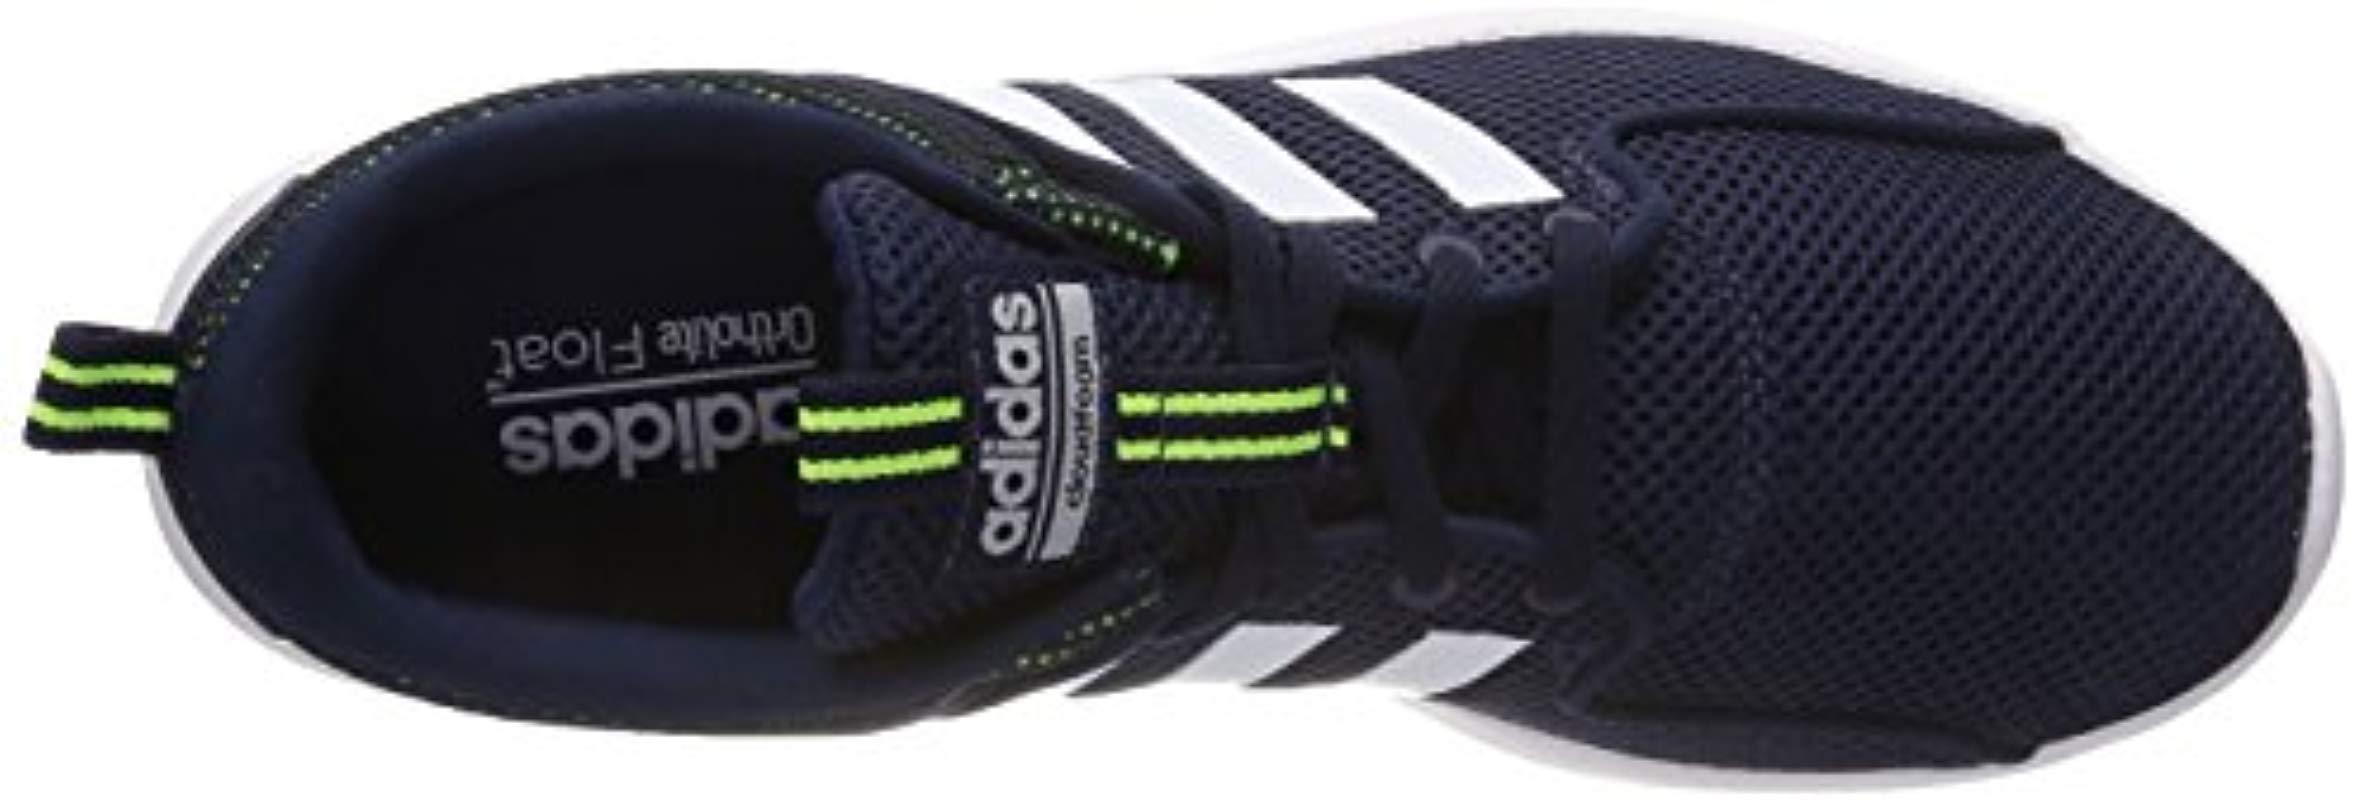 Cloudfoam Lite Racer, Zapatillas para Hombre adidas de hombre de color Azul